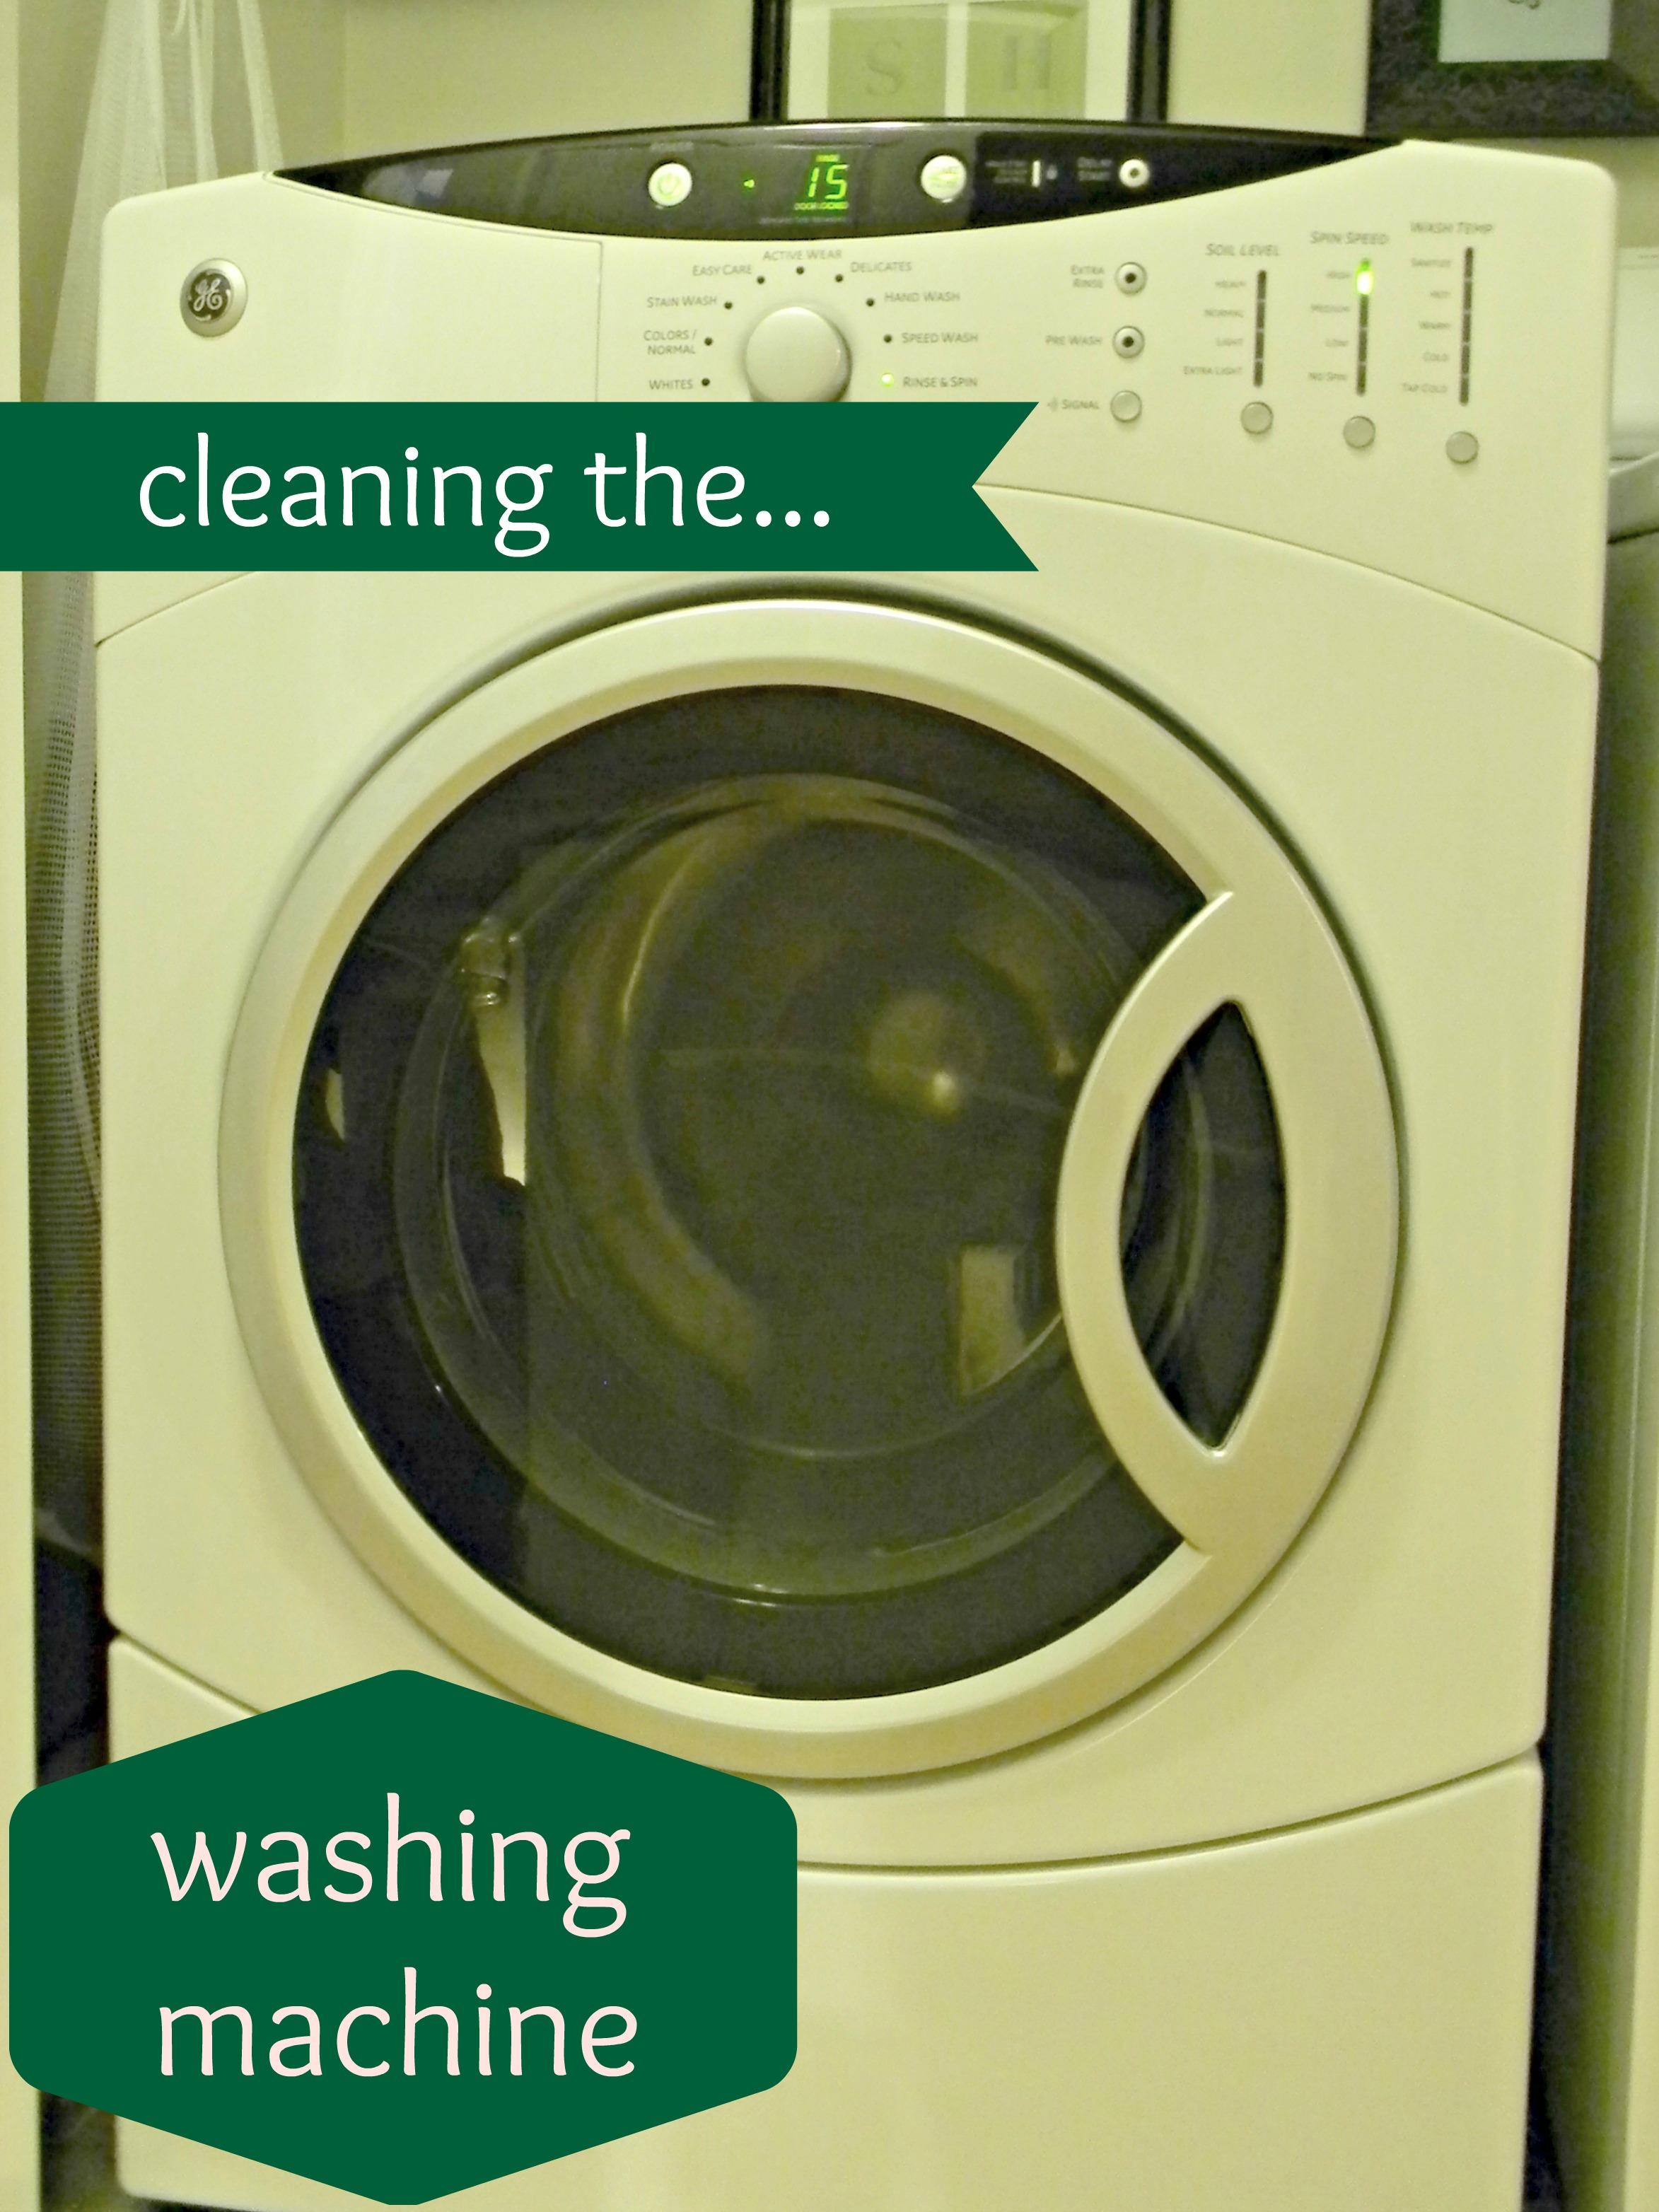 cleaning the washing machine